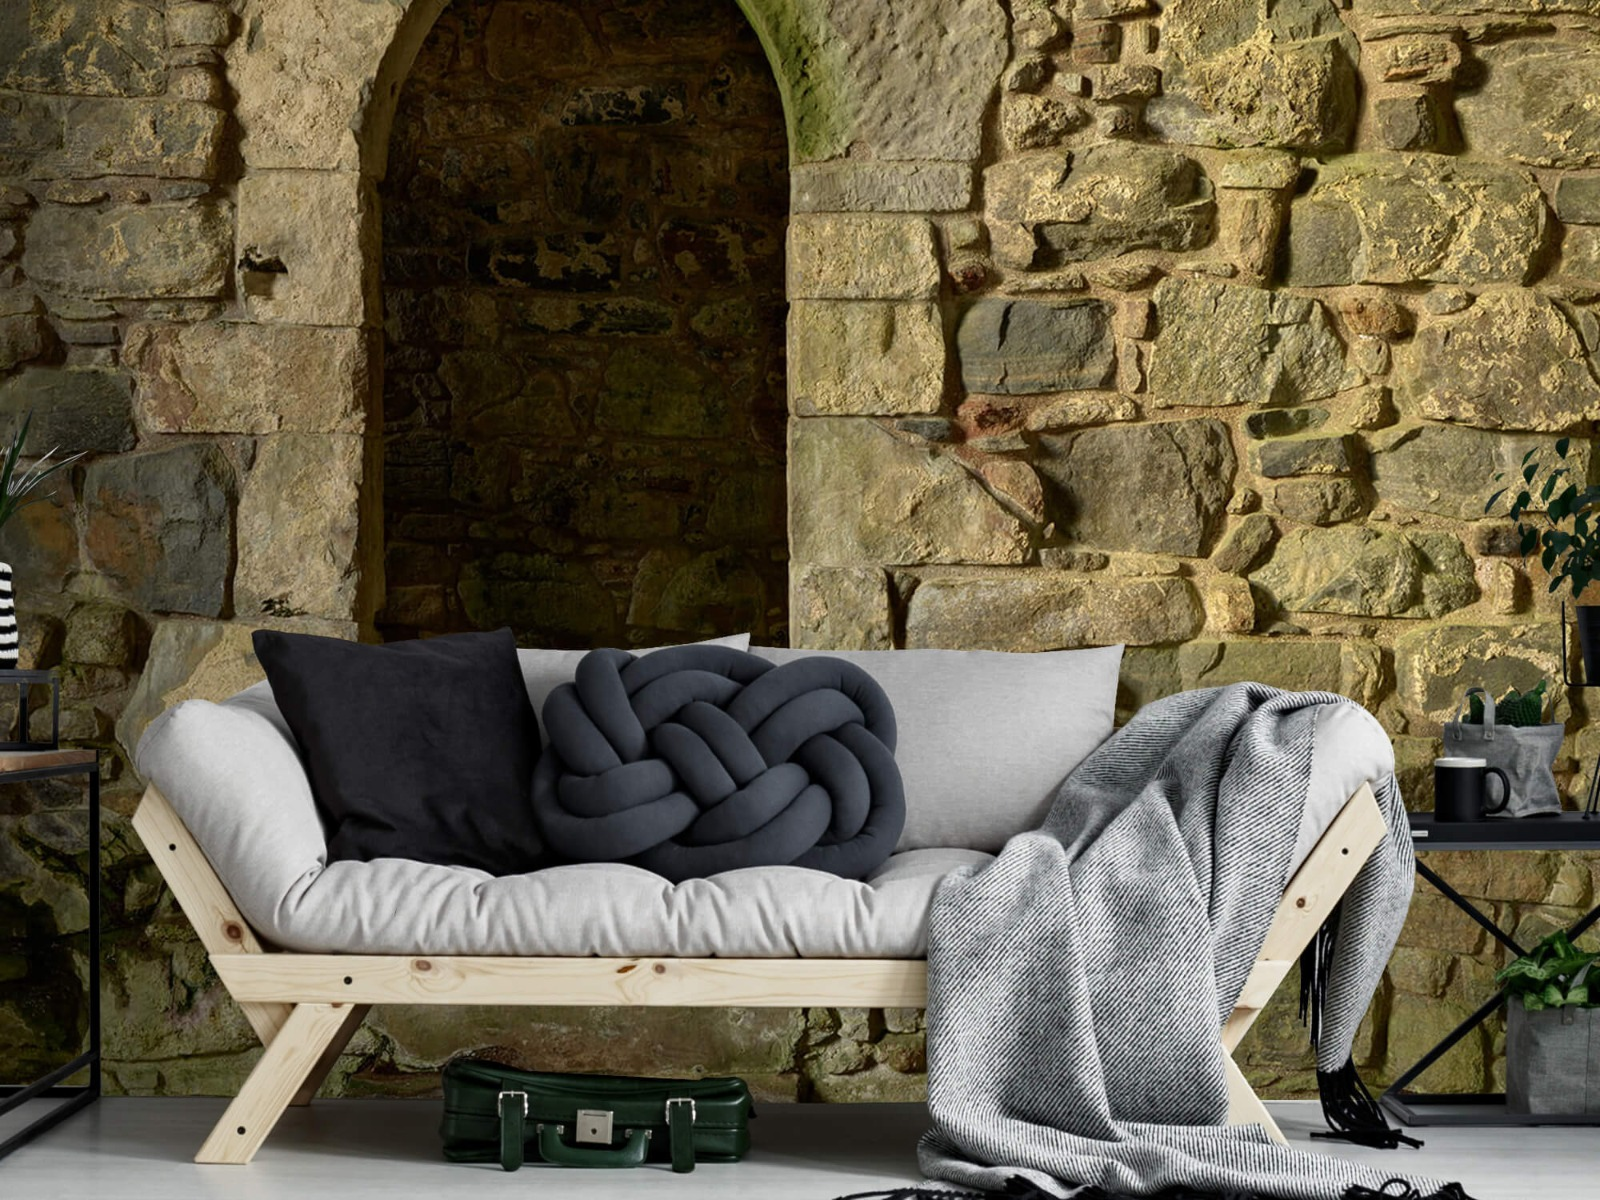 Steen behang - Oude muur met doorgang - Slaapkamer 7